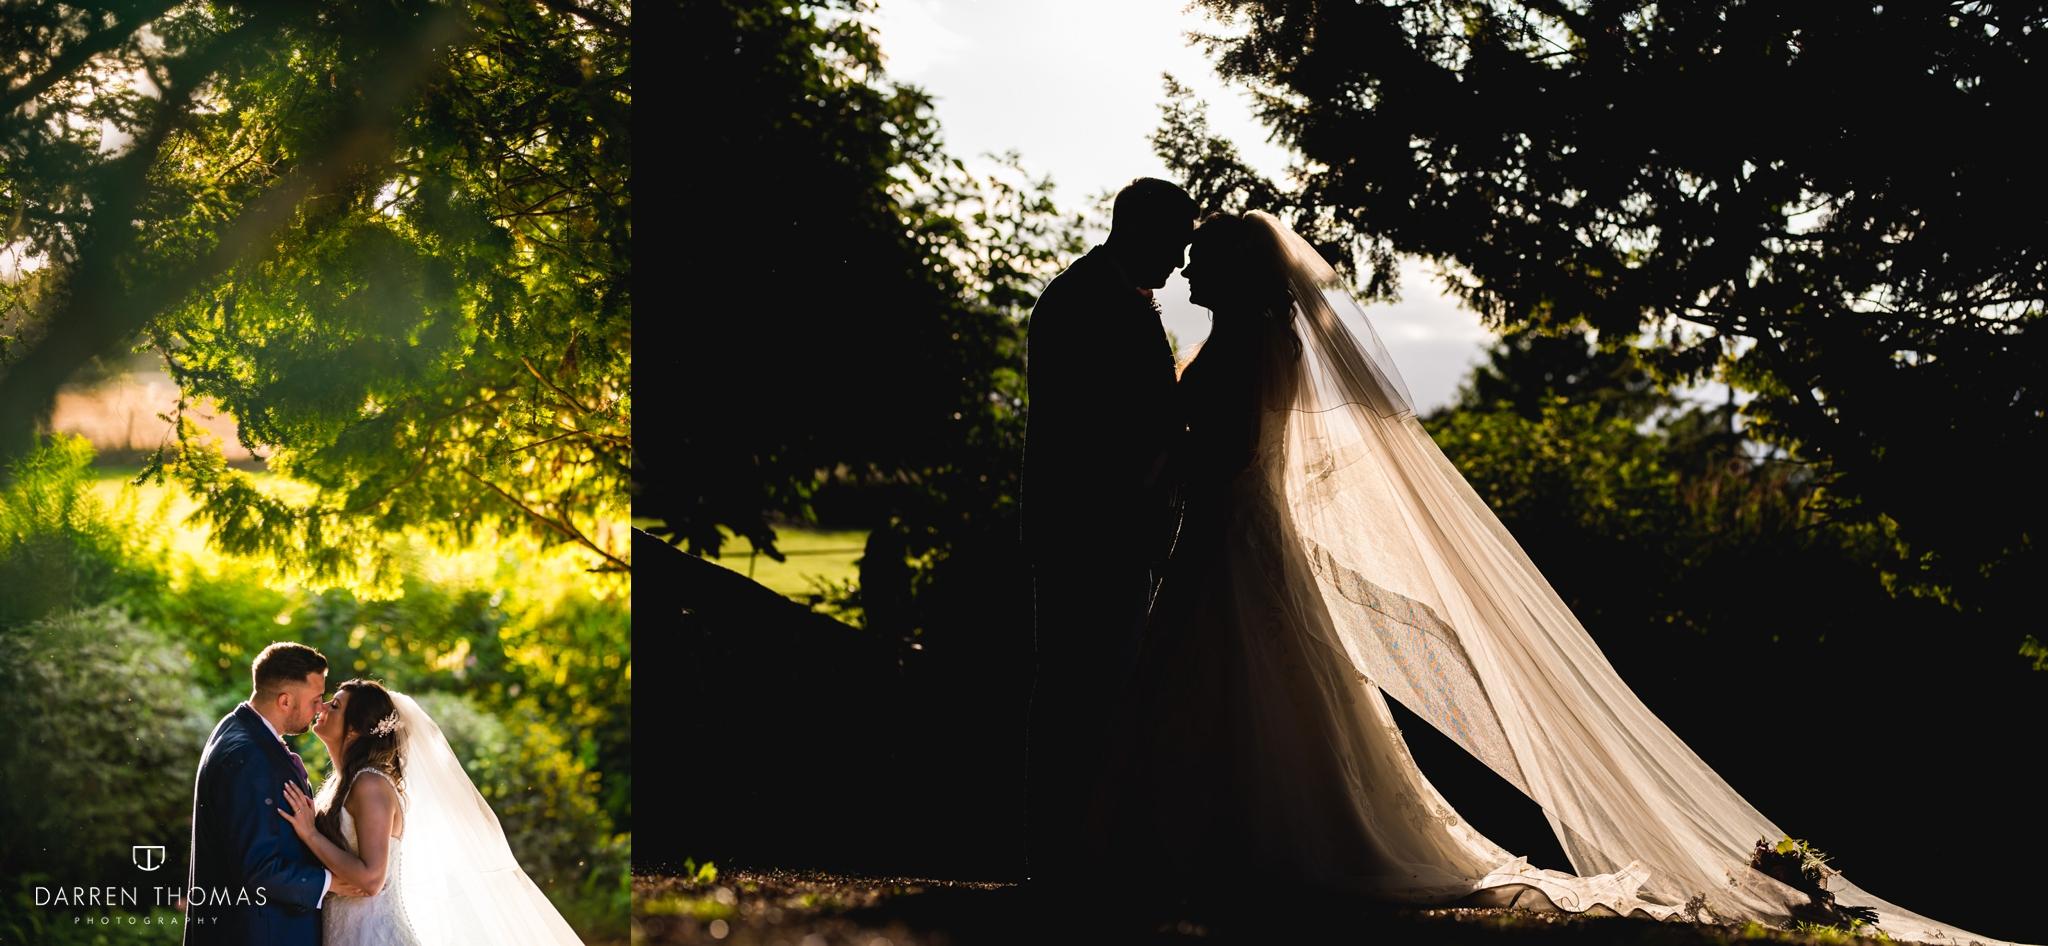 clearwell castle wedding_0007.jpg